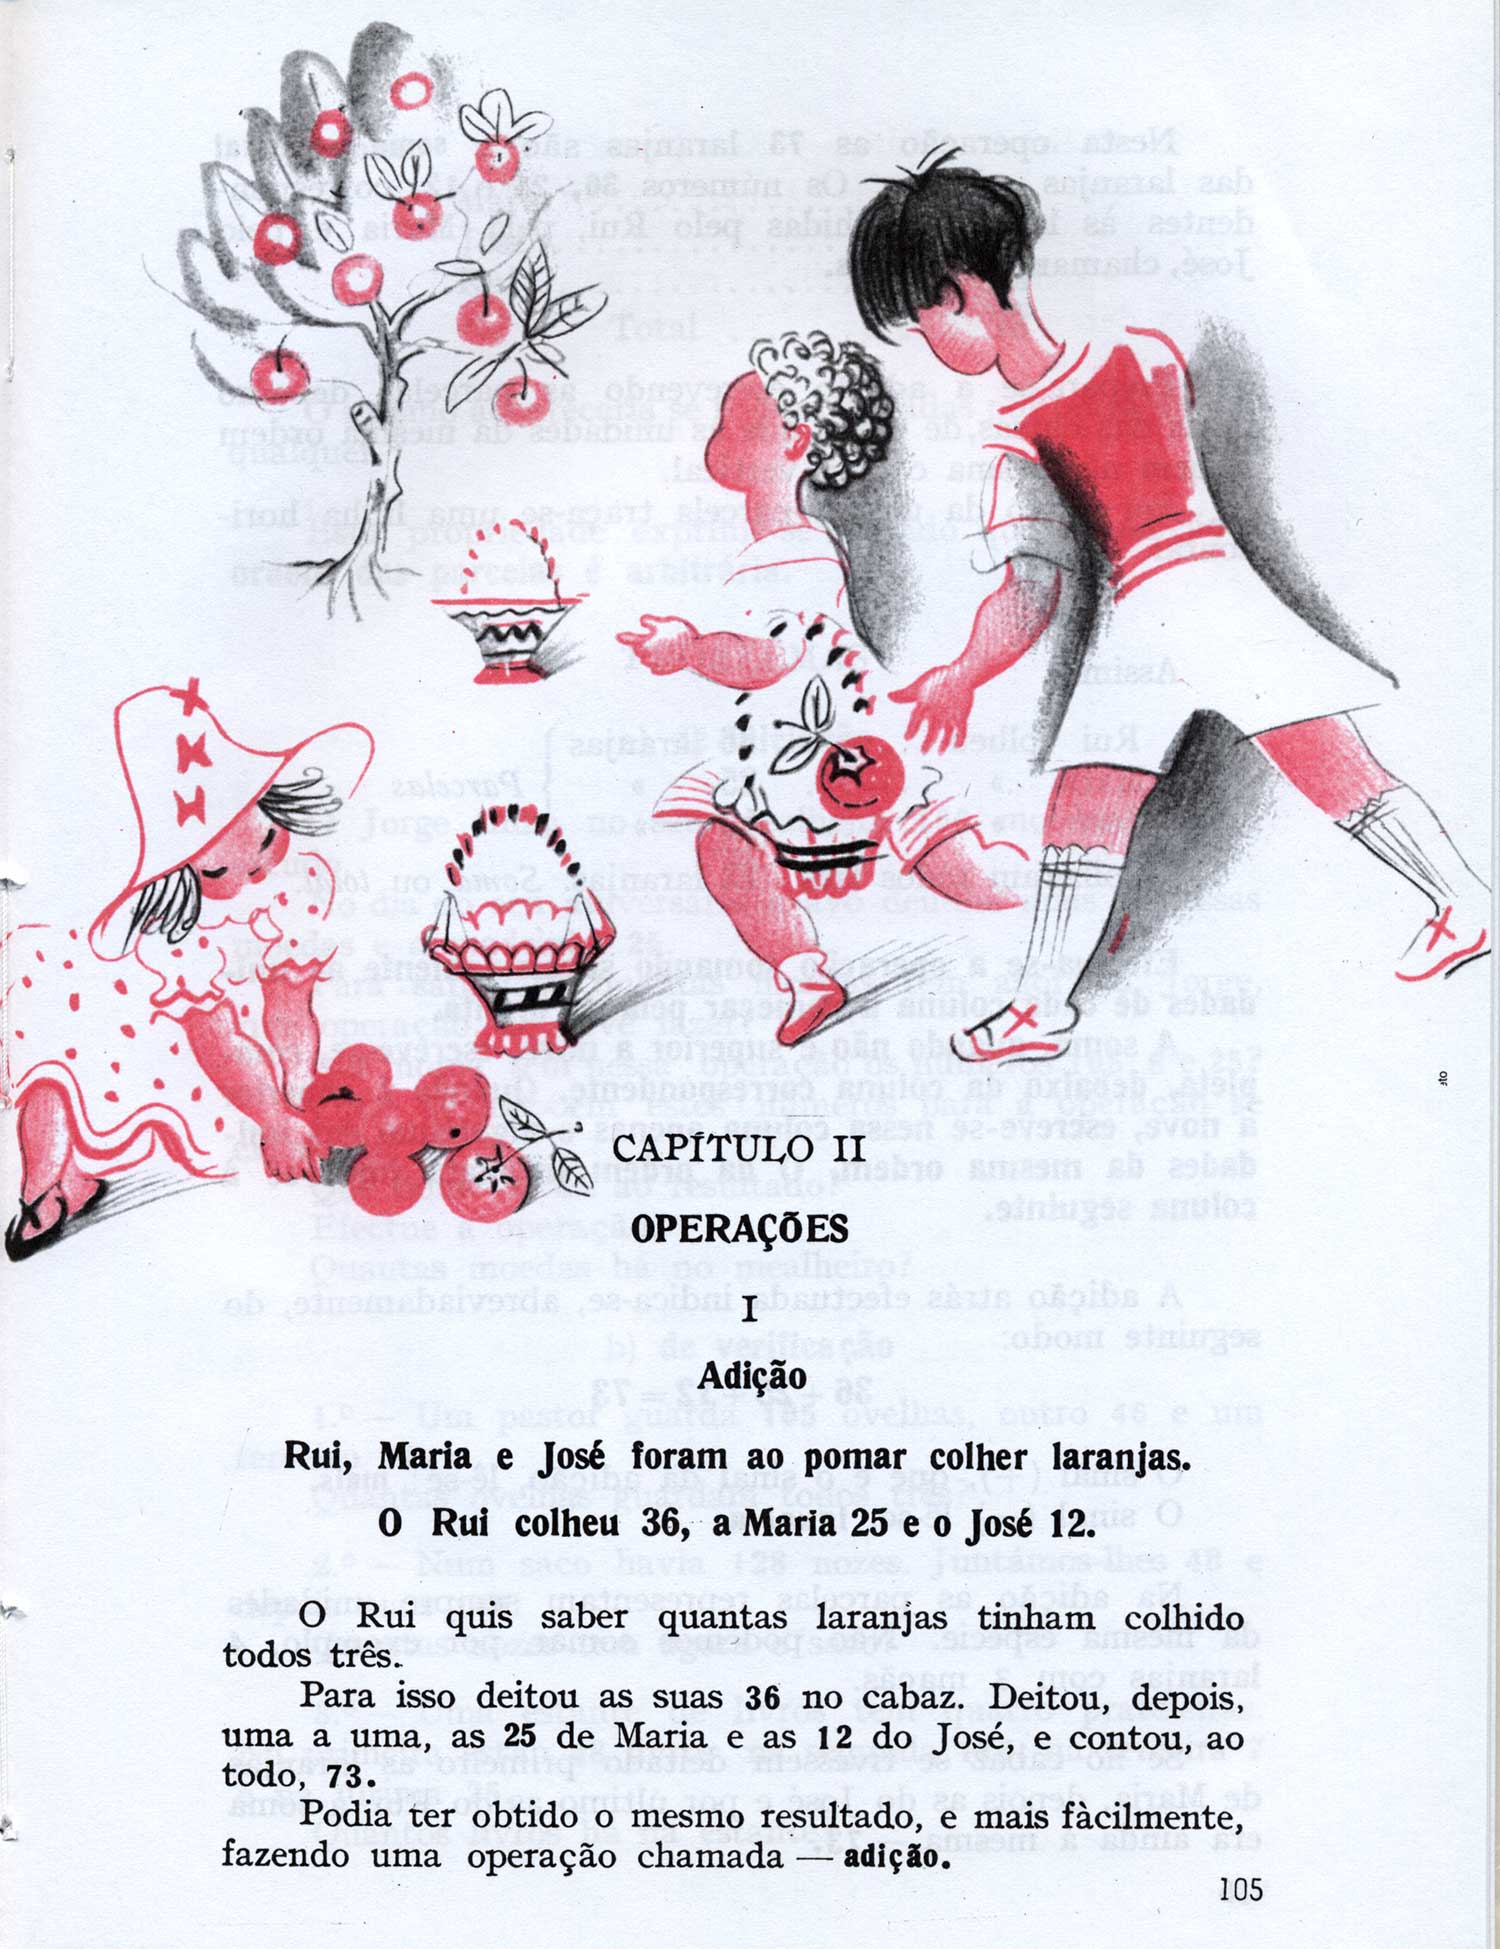 pt_textbk2_105_OLivroDaSegundaClasse_1958.jpg